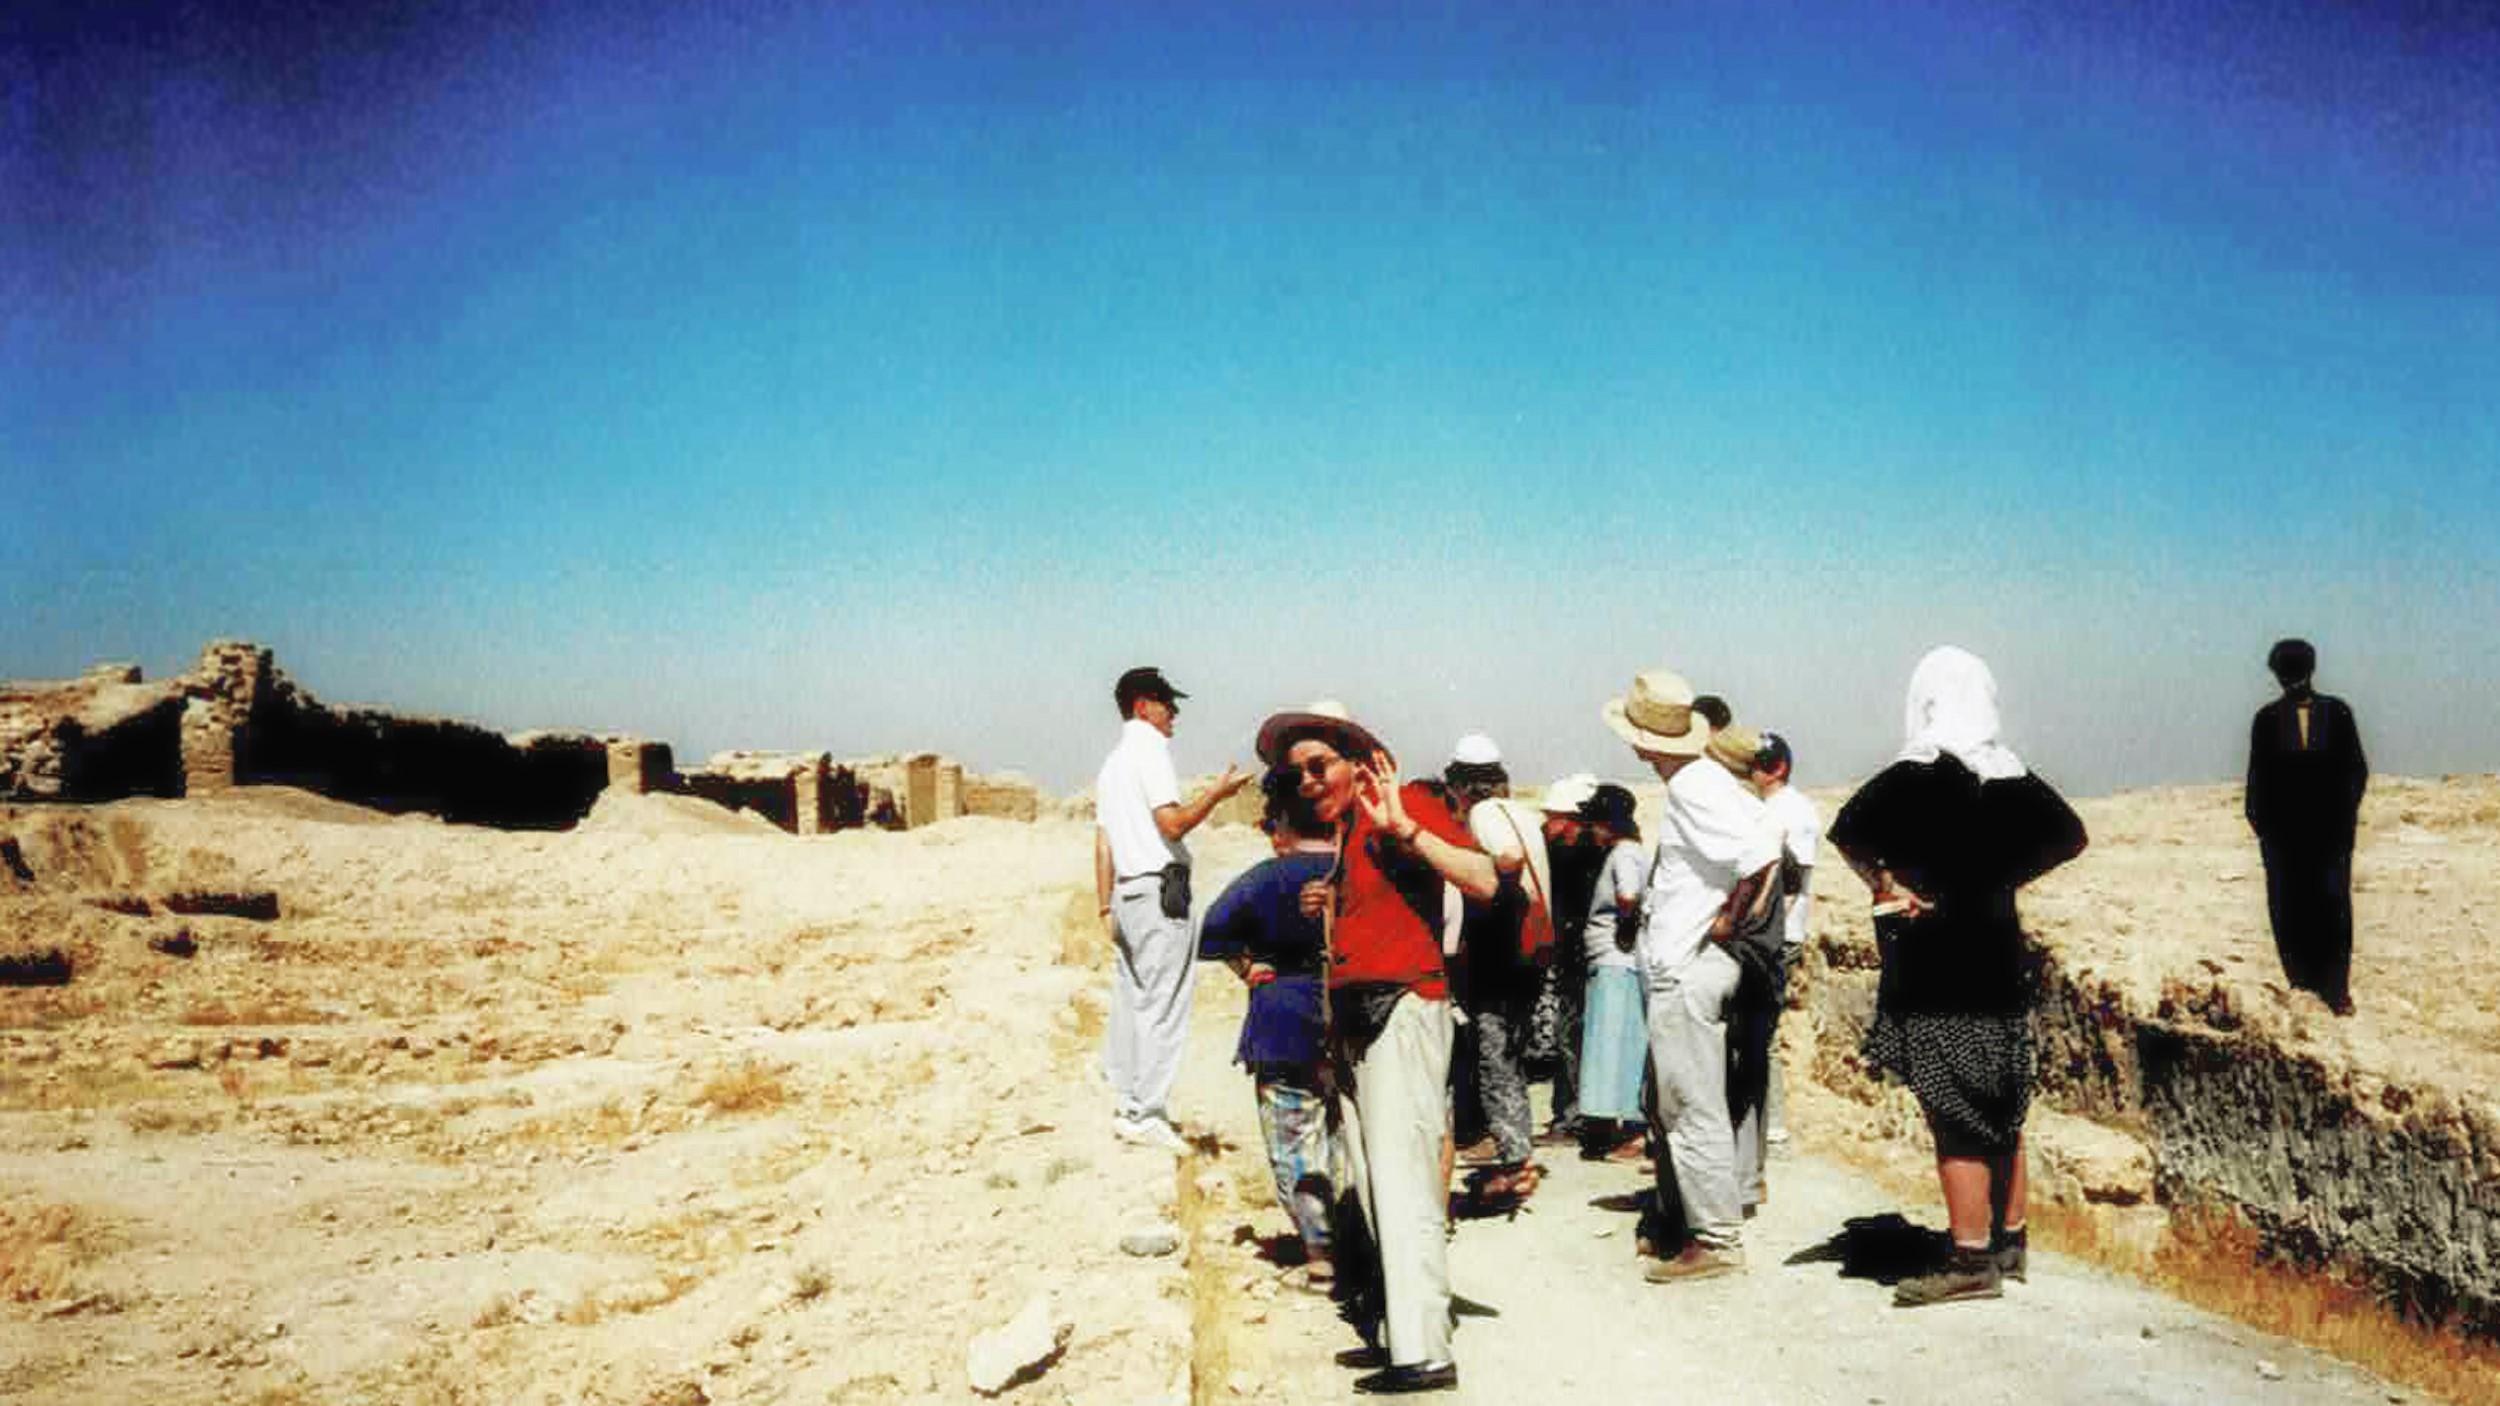 Tour group visiting desert ruins